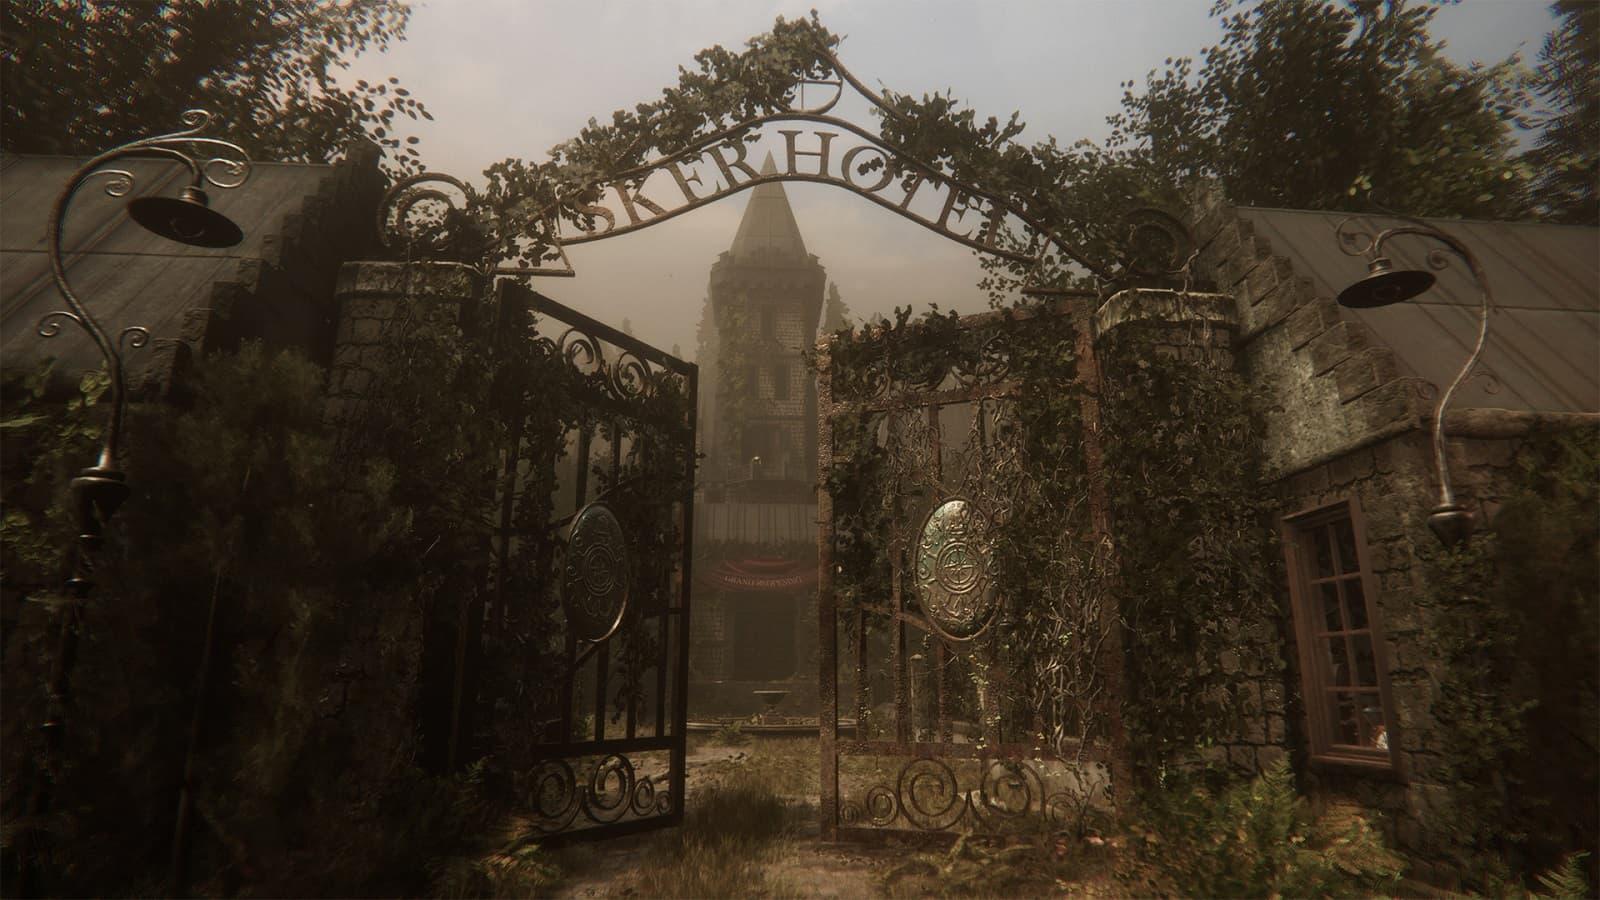 Рецензия на игру Maid of Sker - готический клон ремейка Resident Evil 2 с примесью Amnesia - 01